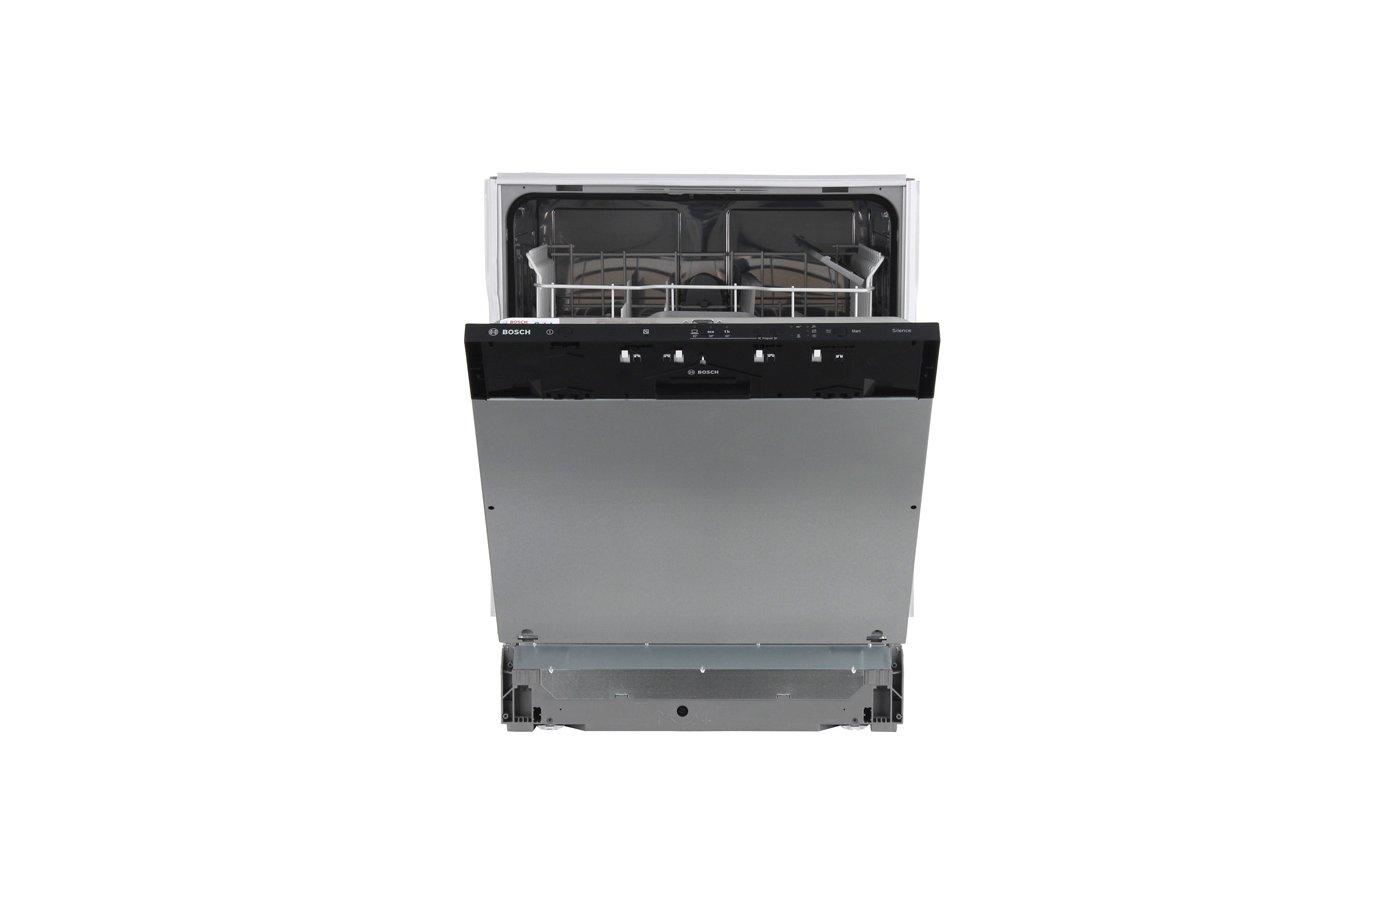 Посудомоечная машина bosch serie 2 smv 23ax00 r